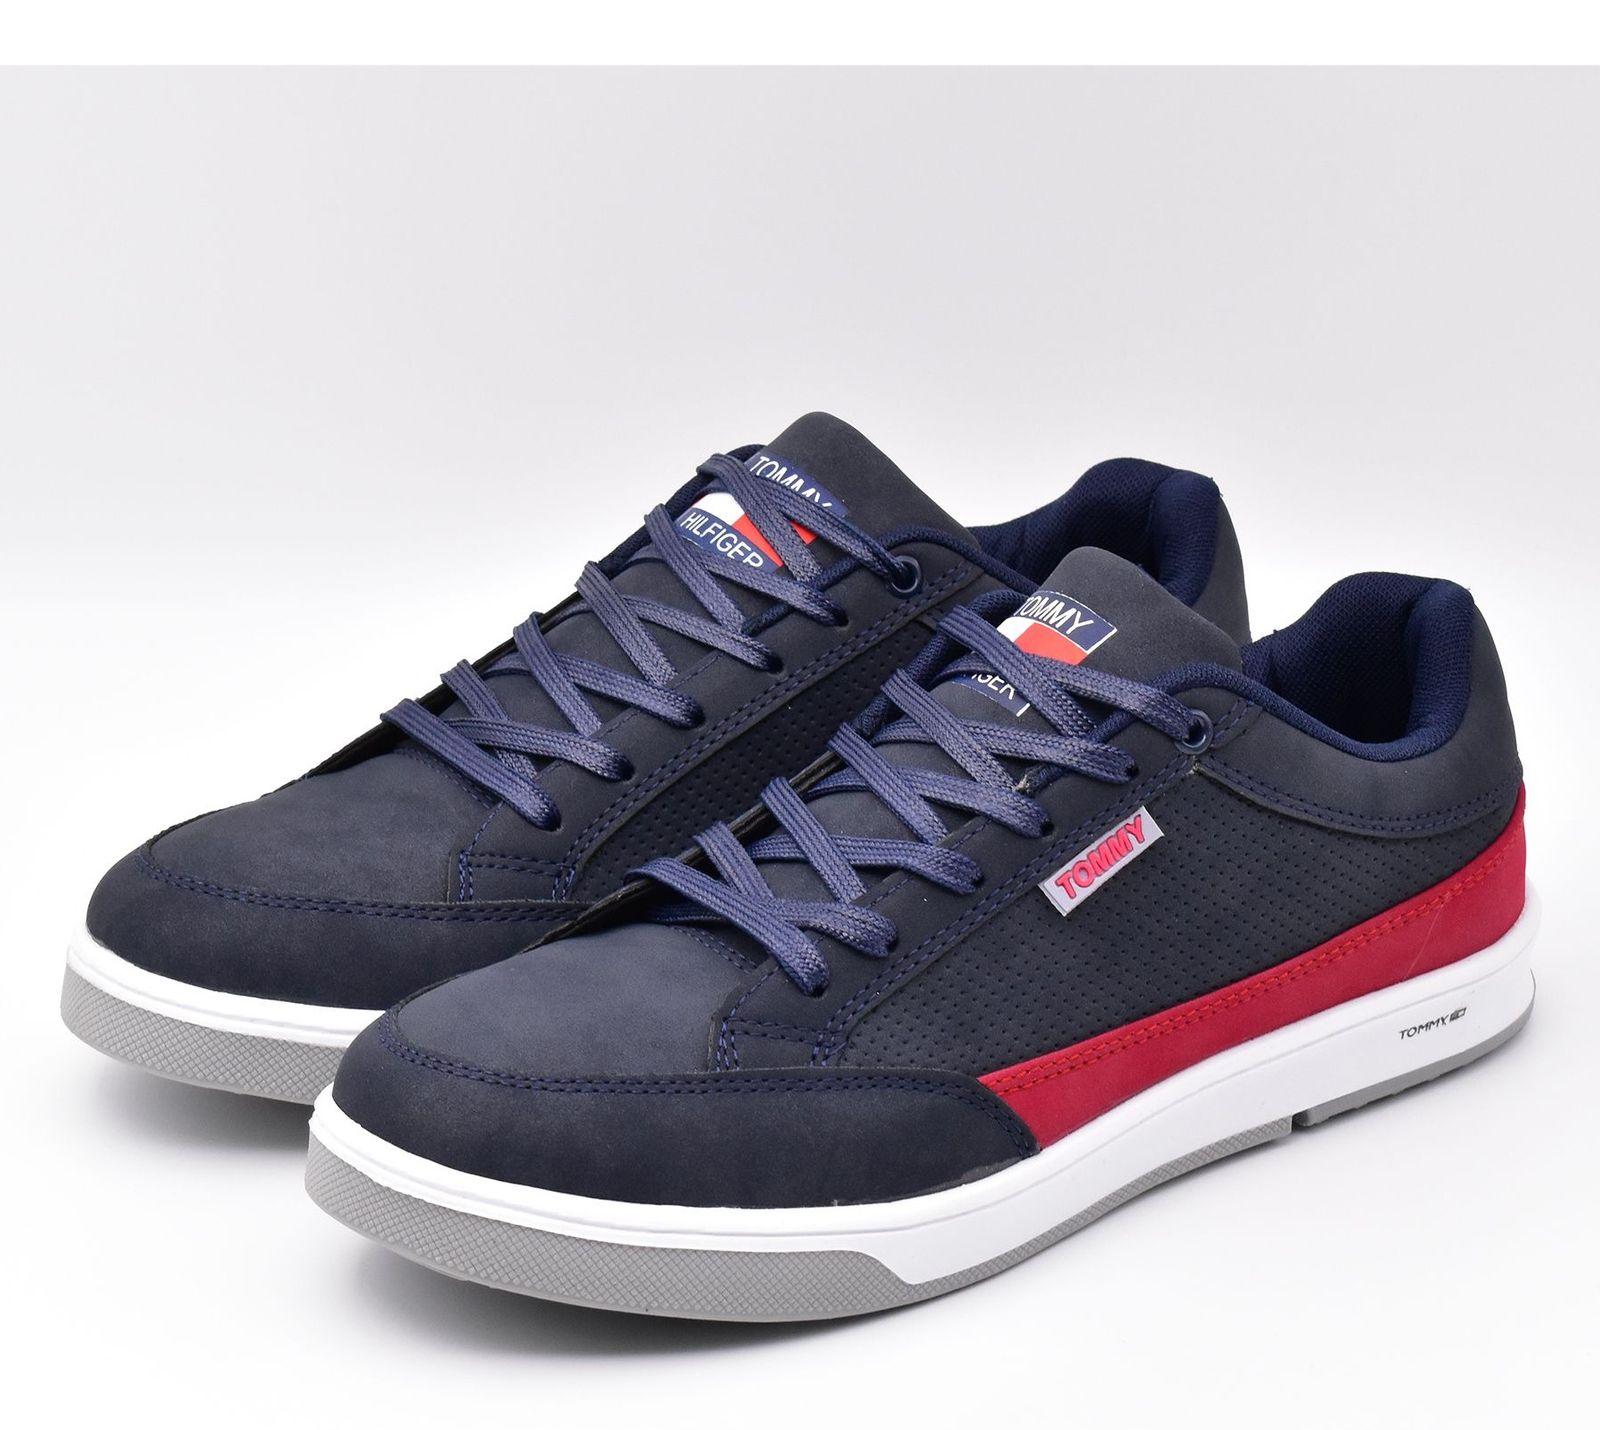 کفش روزمره مردانه مدل رهاورد کد 5513 -  - 10